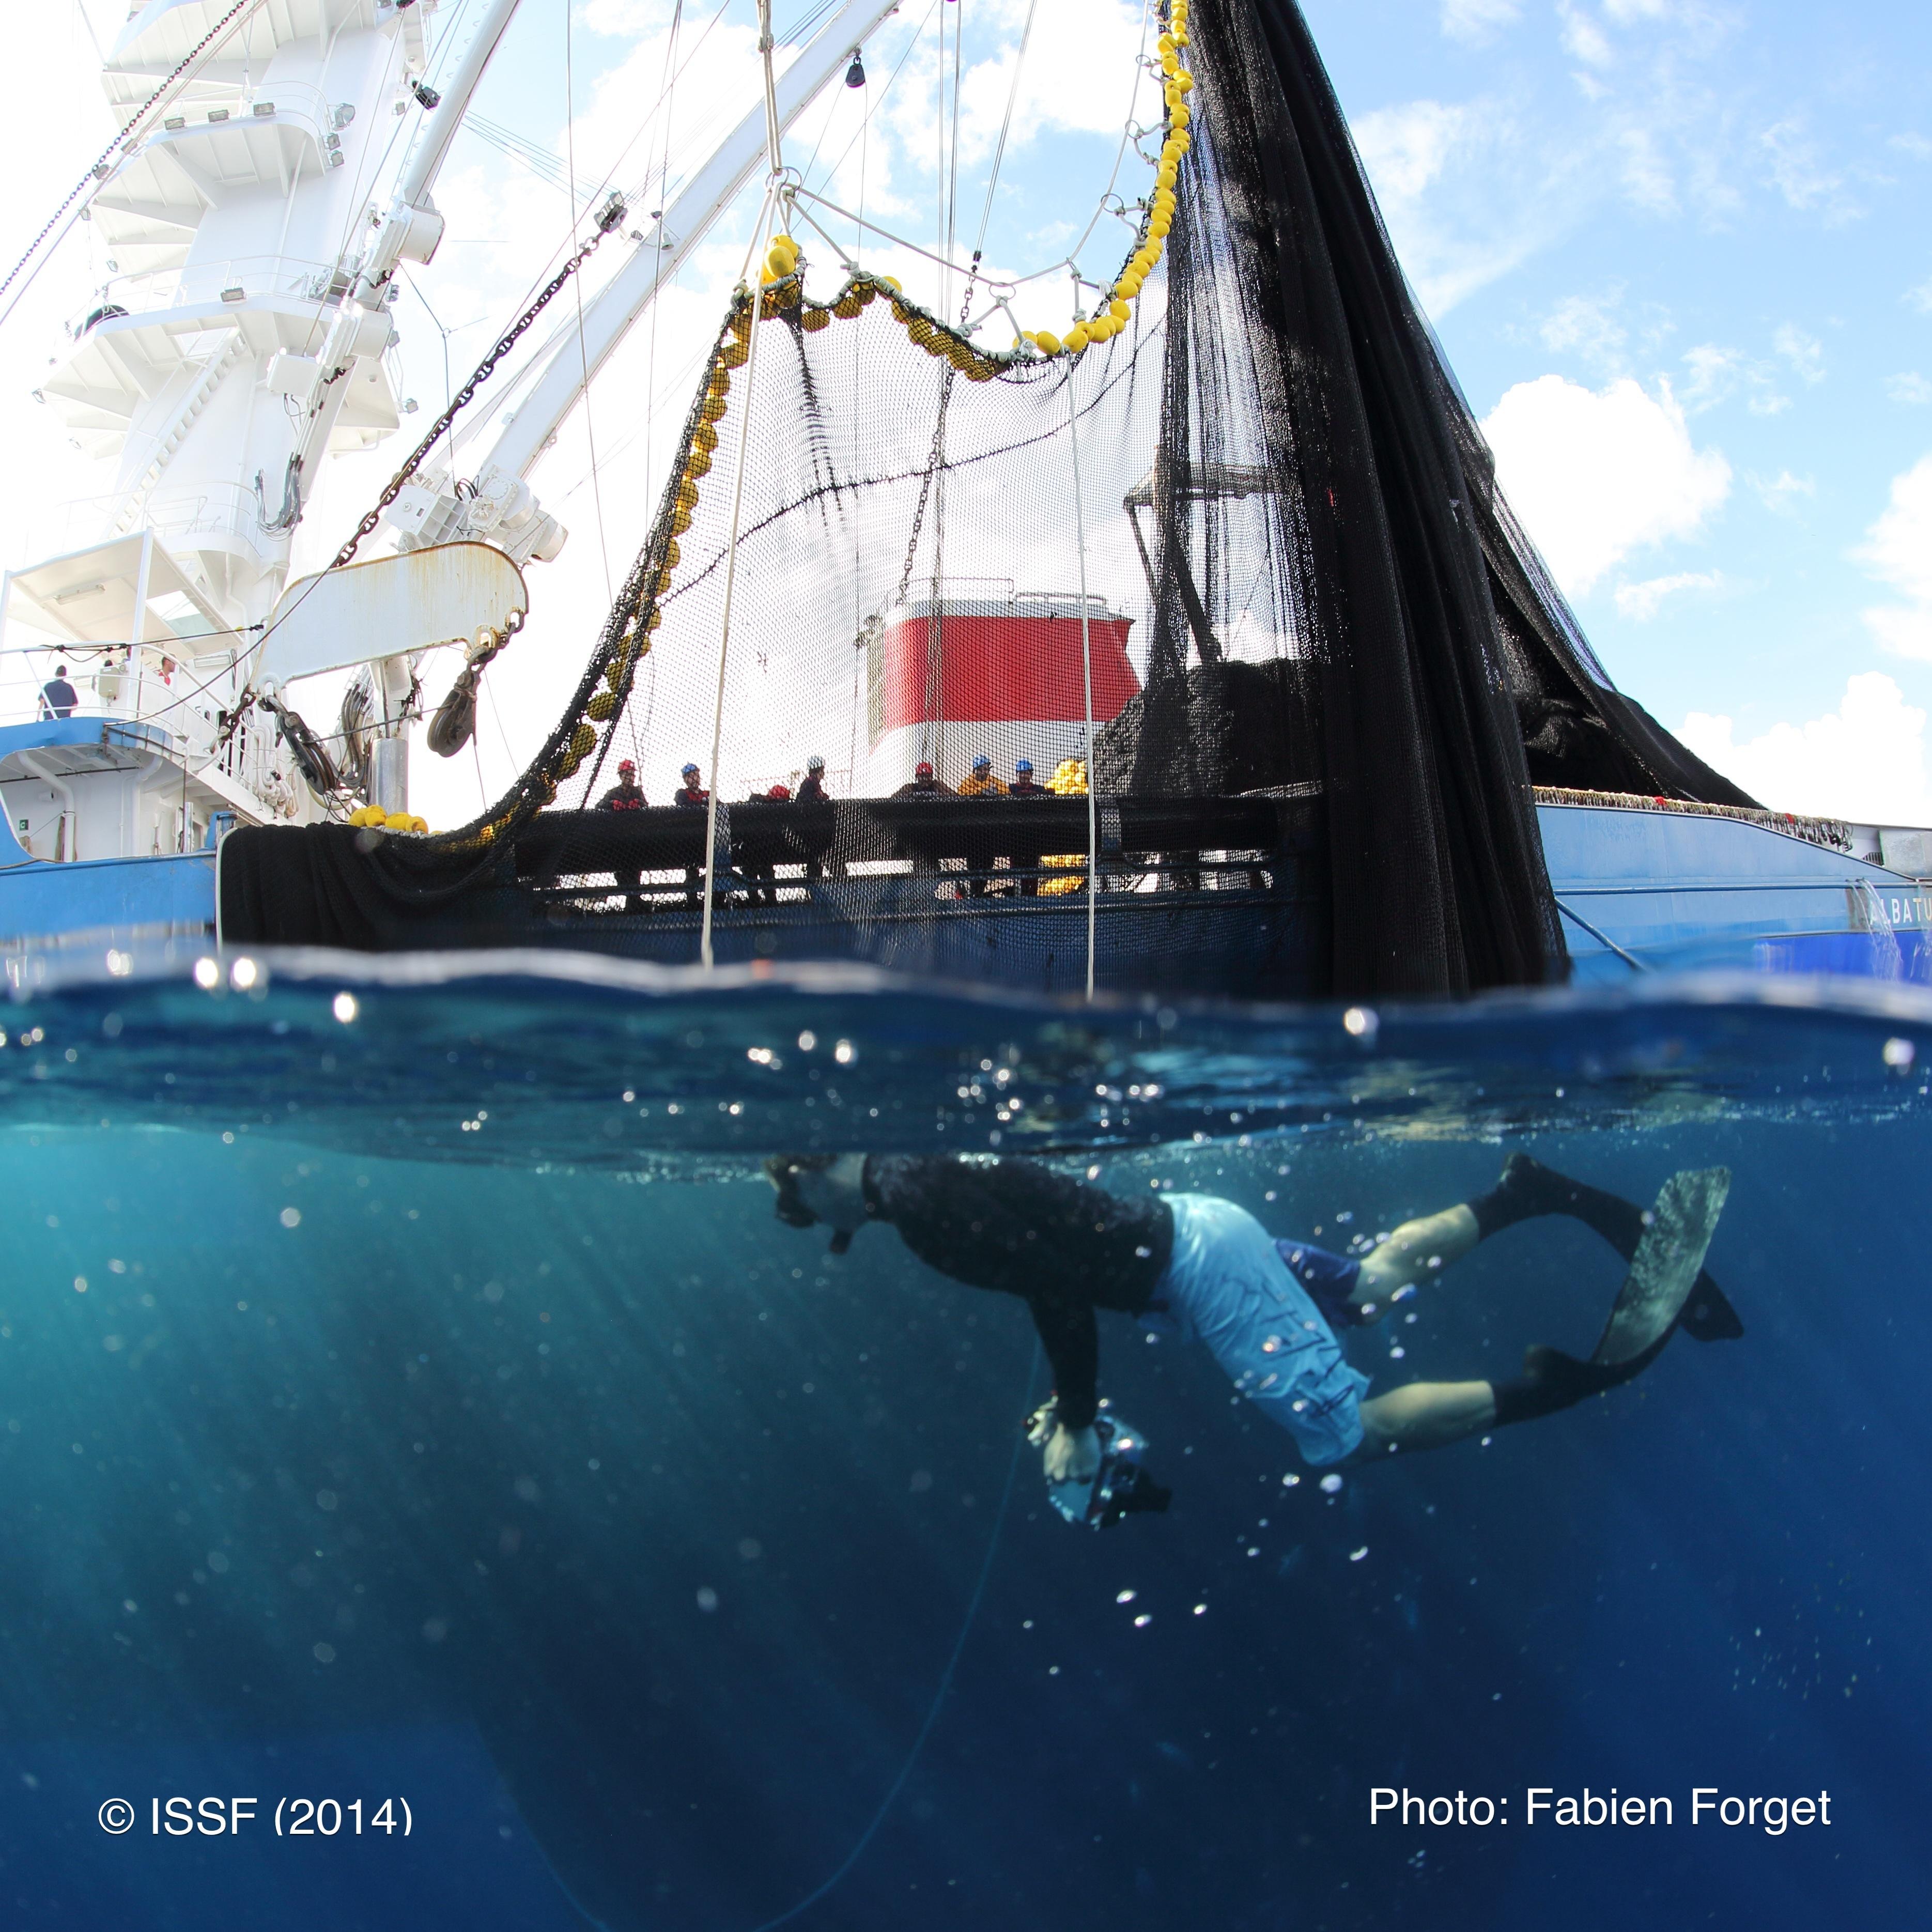 2014.05-WCPO-FabienForget-532